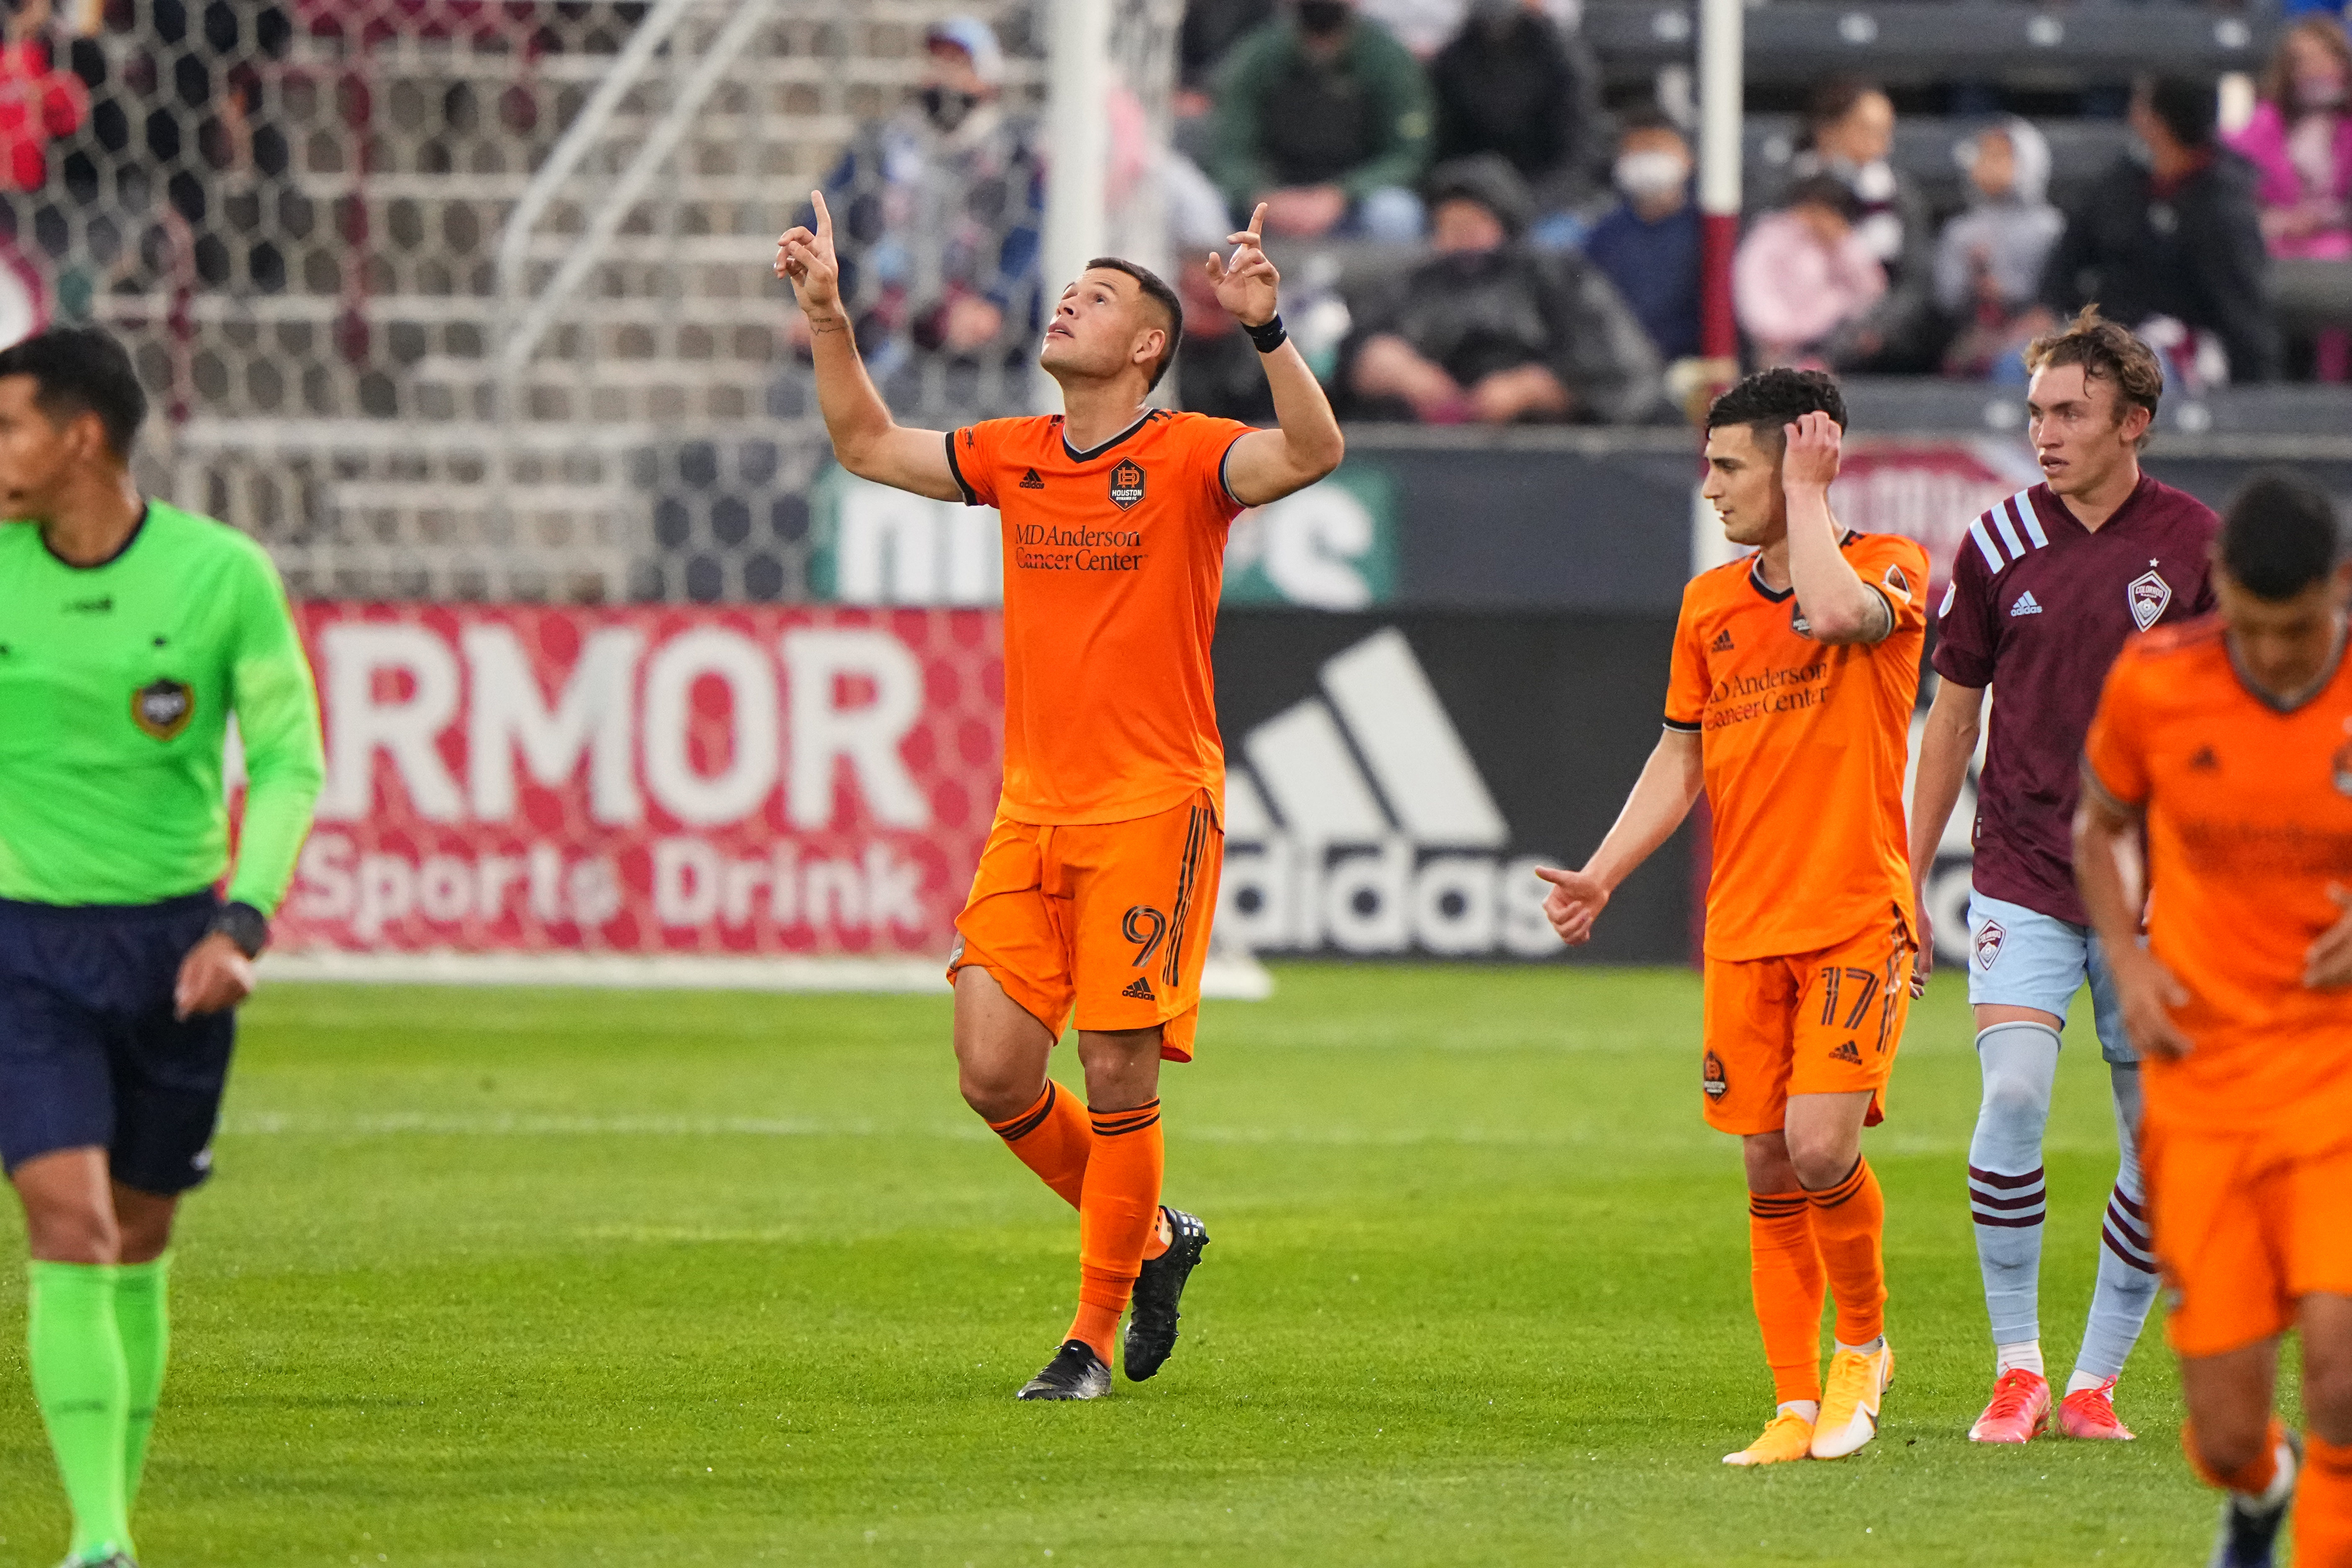 Houston Dynamo FC transfer forward Christian Ramirez to Aberdeen Football Club   | Houston Dynamo